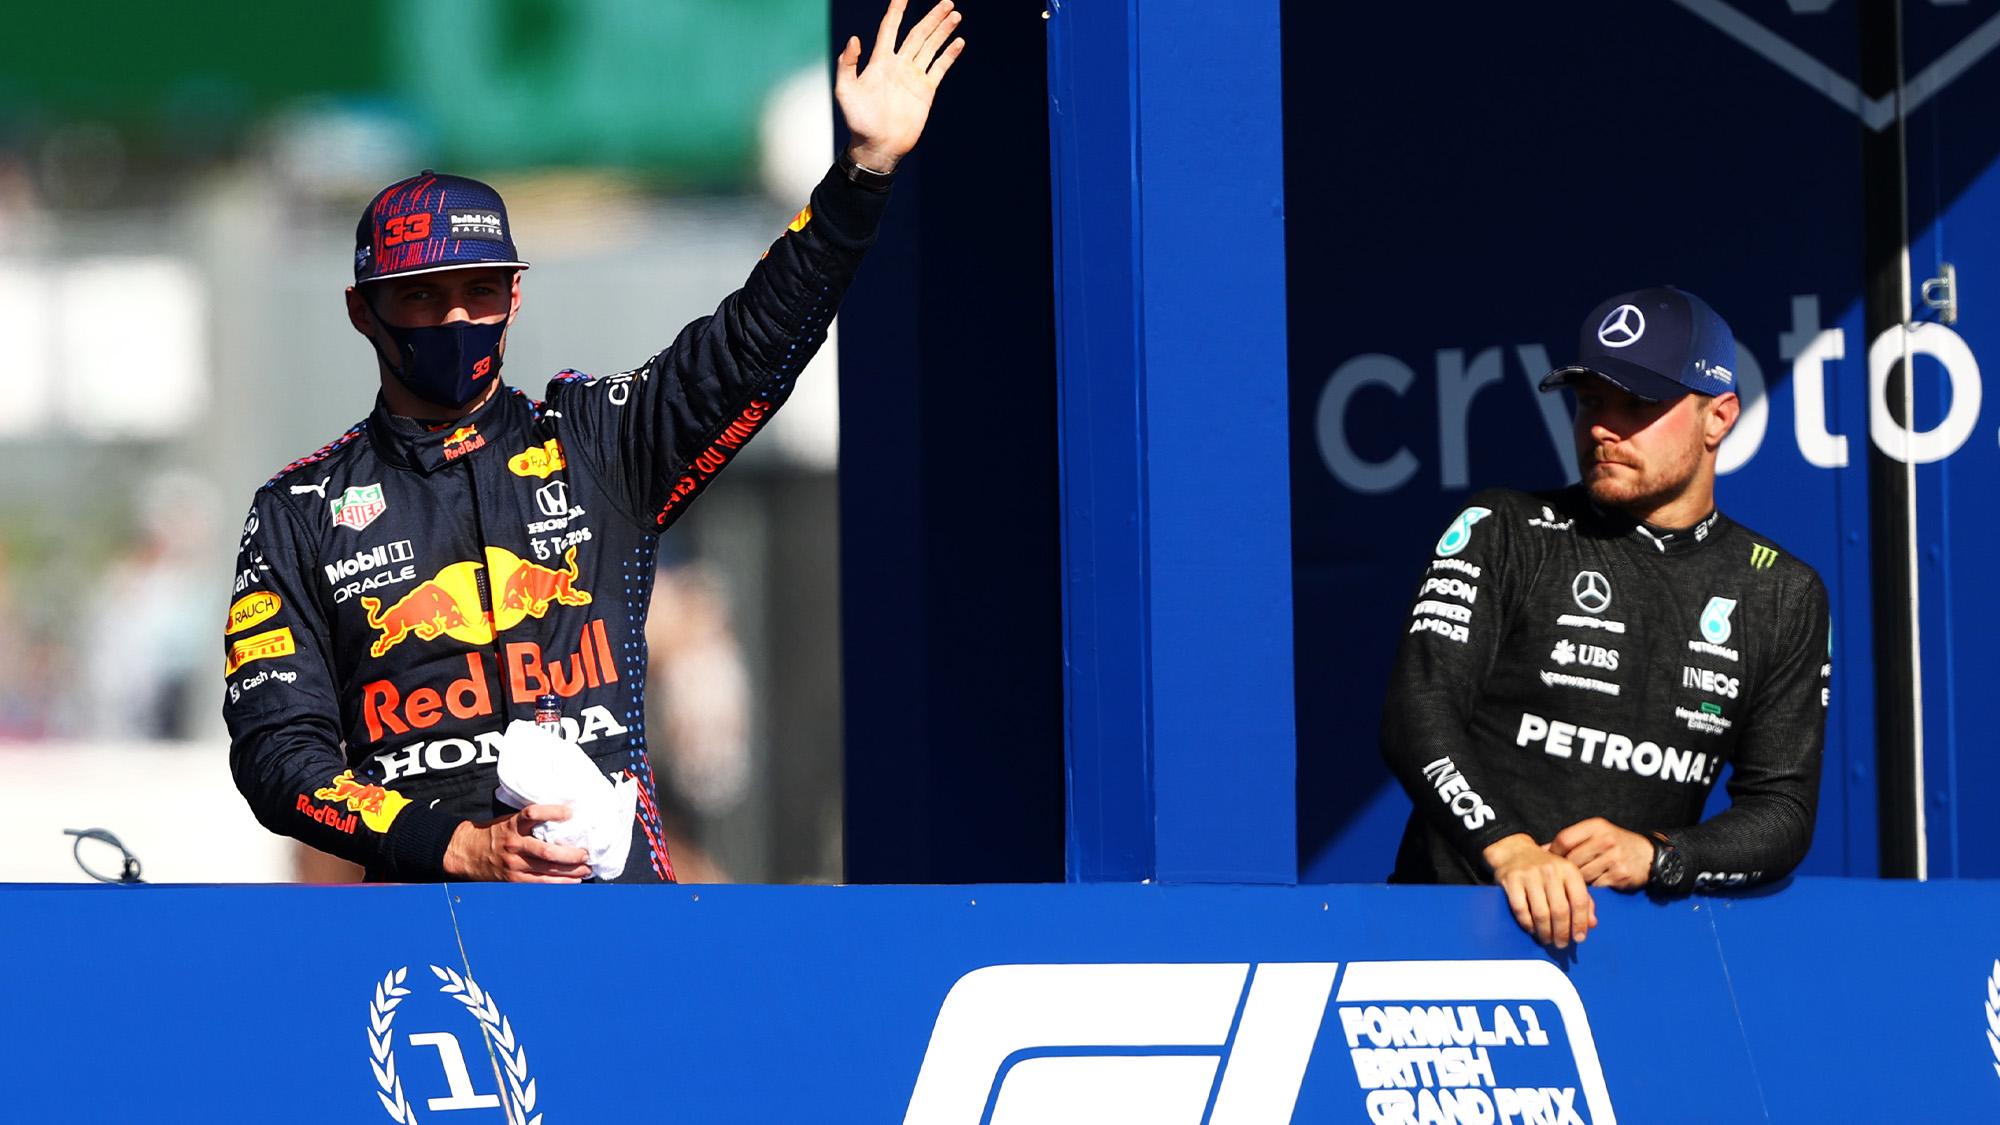 Max Verstappen after winning the first Formula 1 Sprint Qualifying race